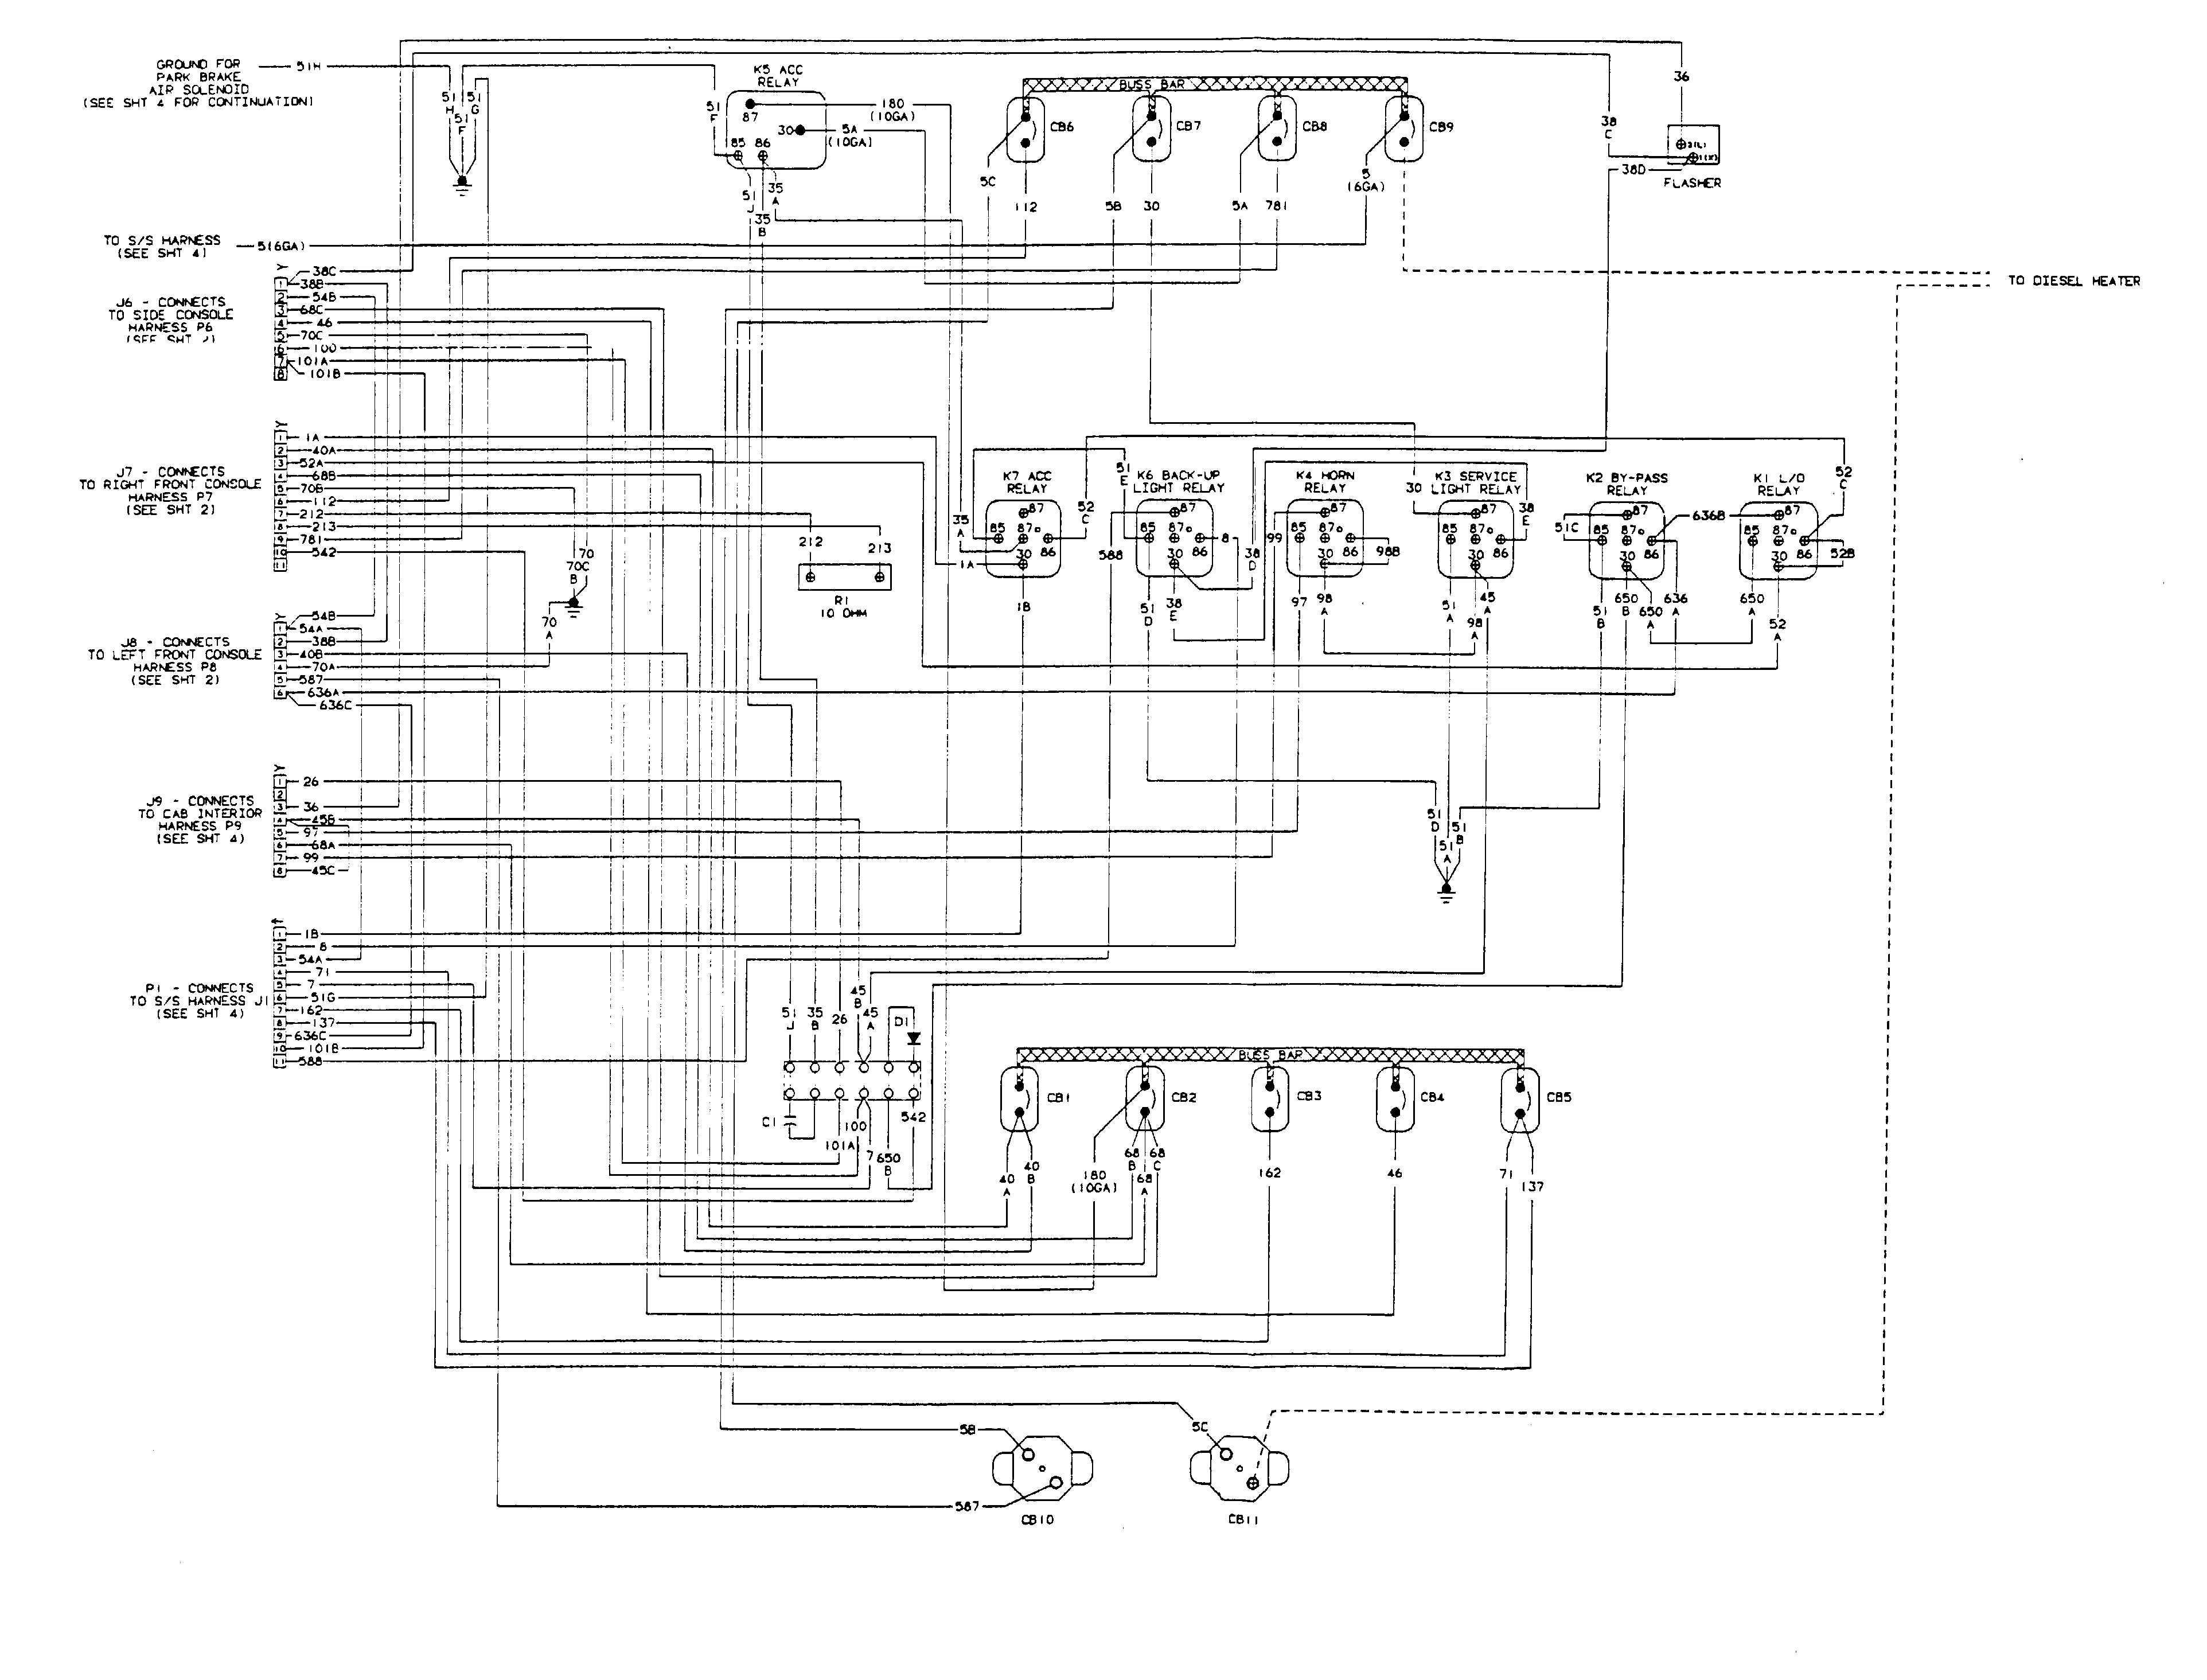 Overhead Crane Wiring Diagram Pdf : Overhead crane control wiring diagram somurich